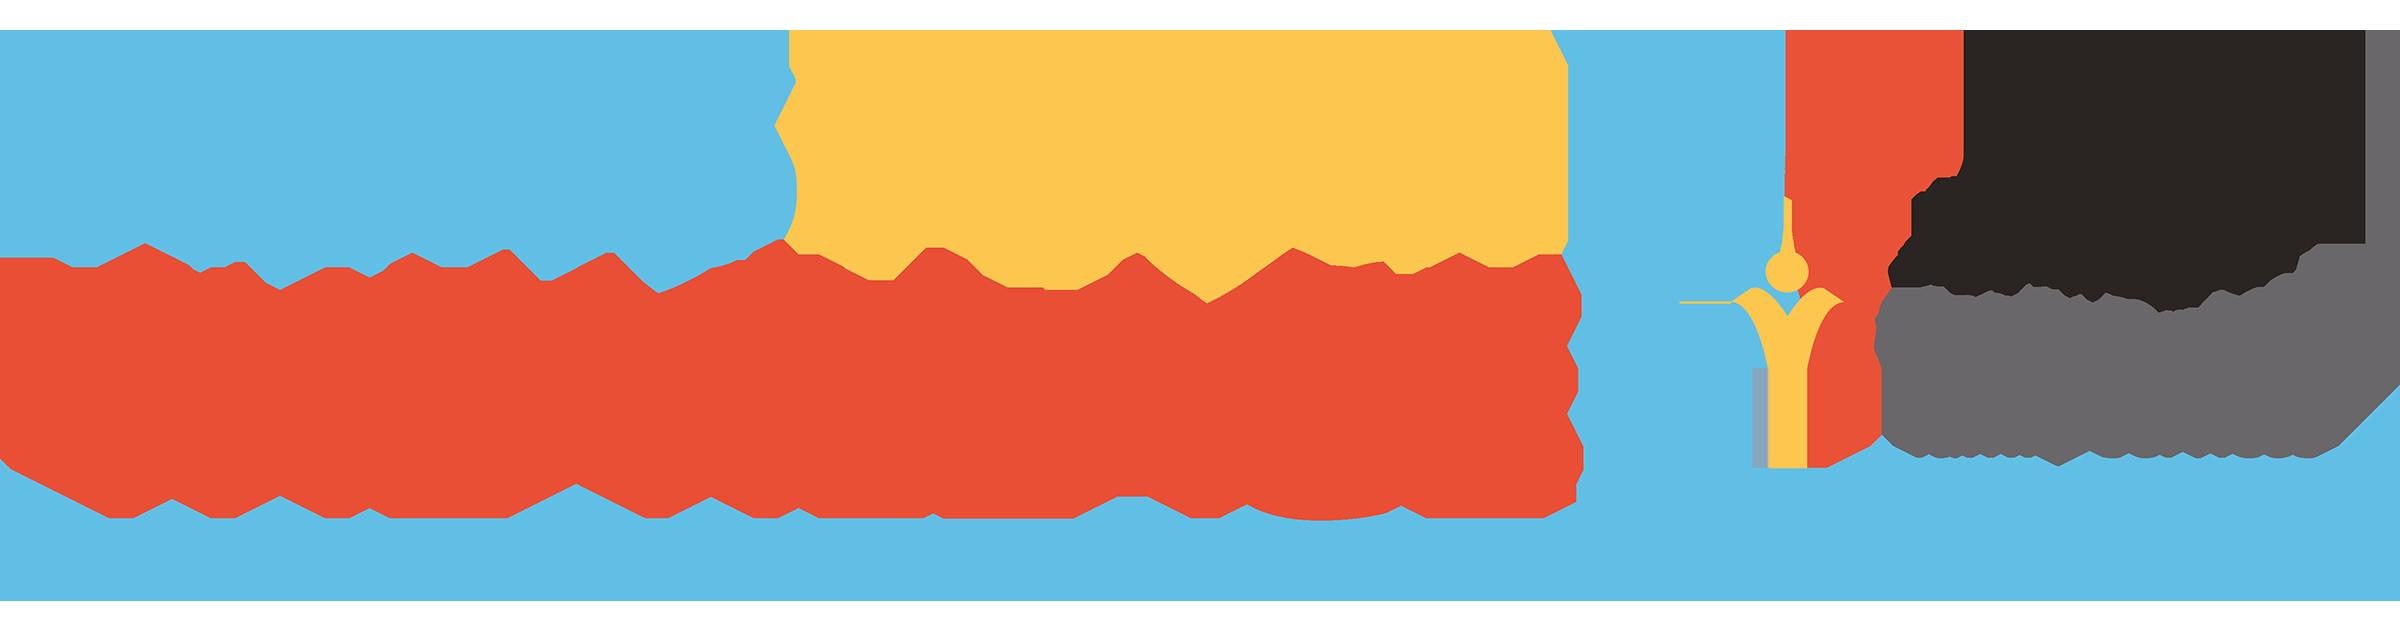 2020VFS e-newsletters from Village mst